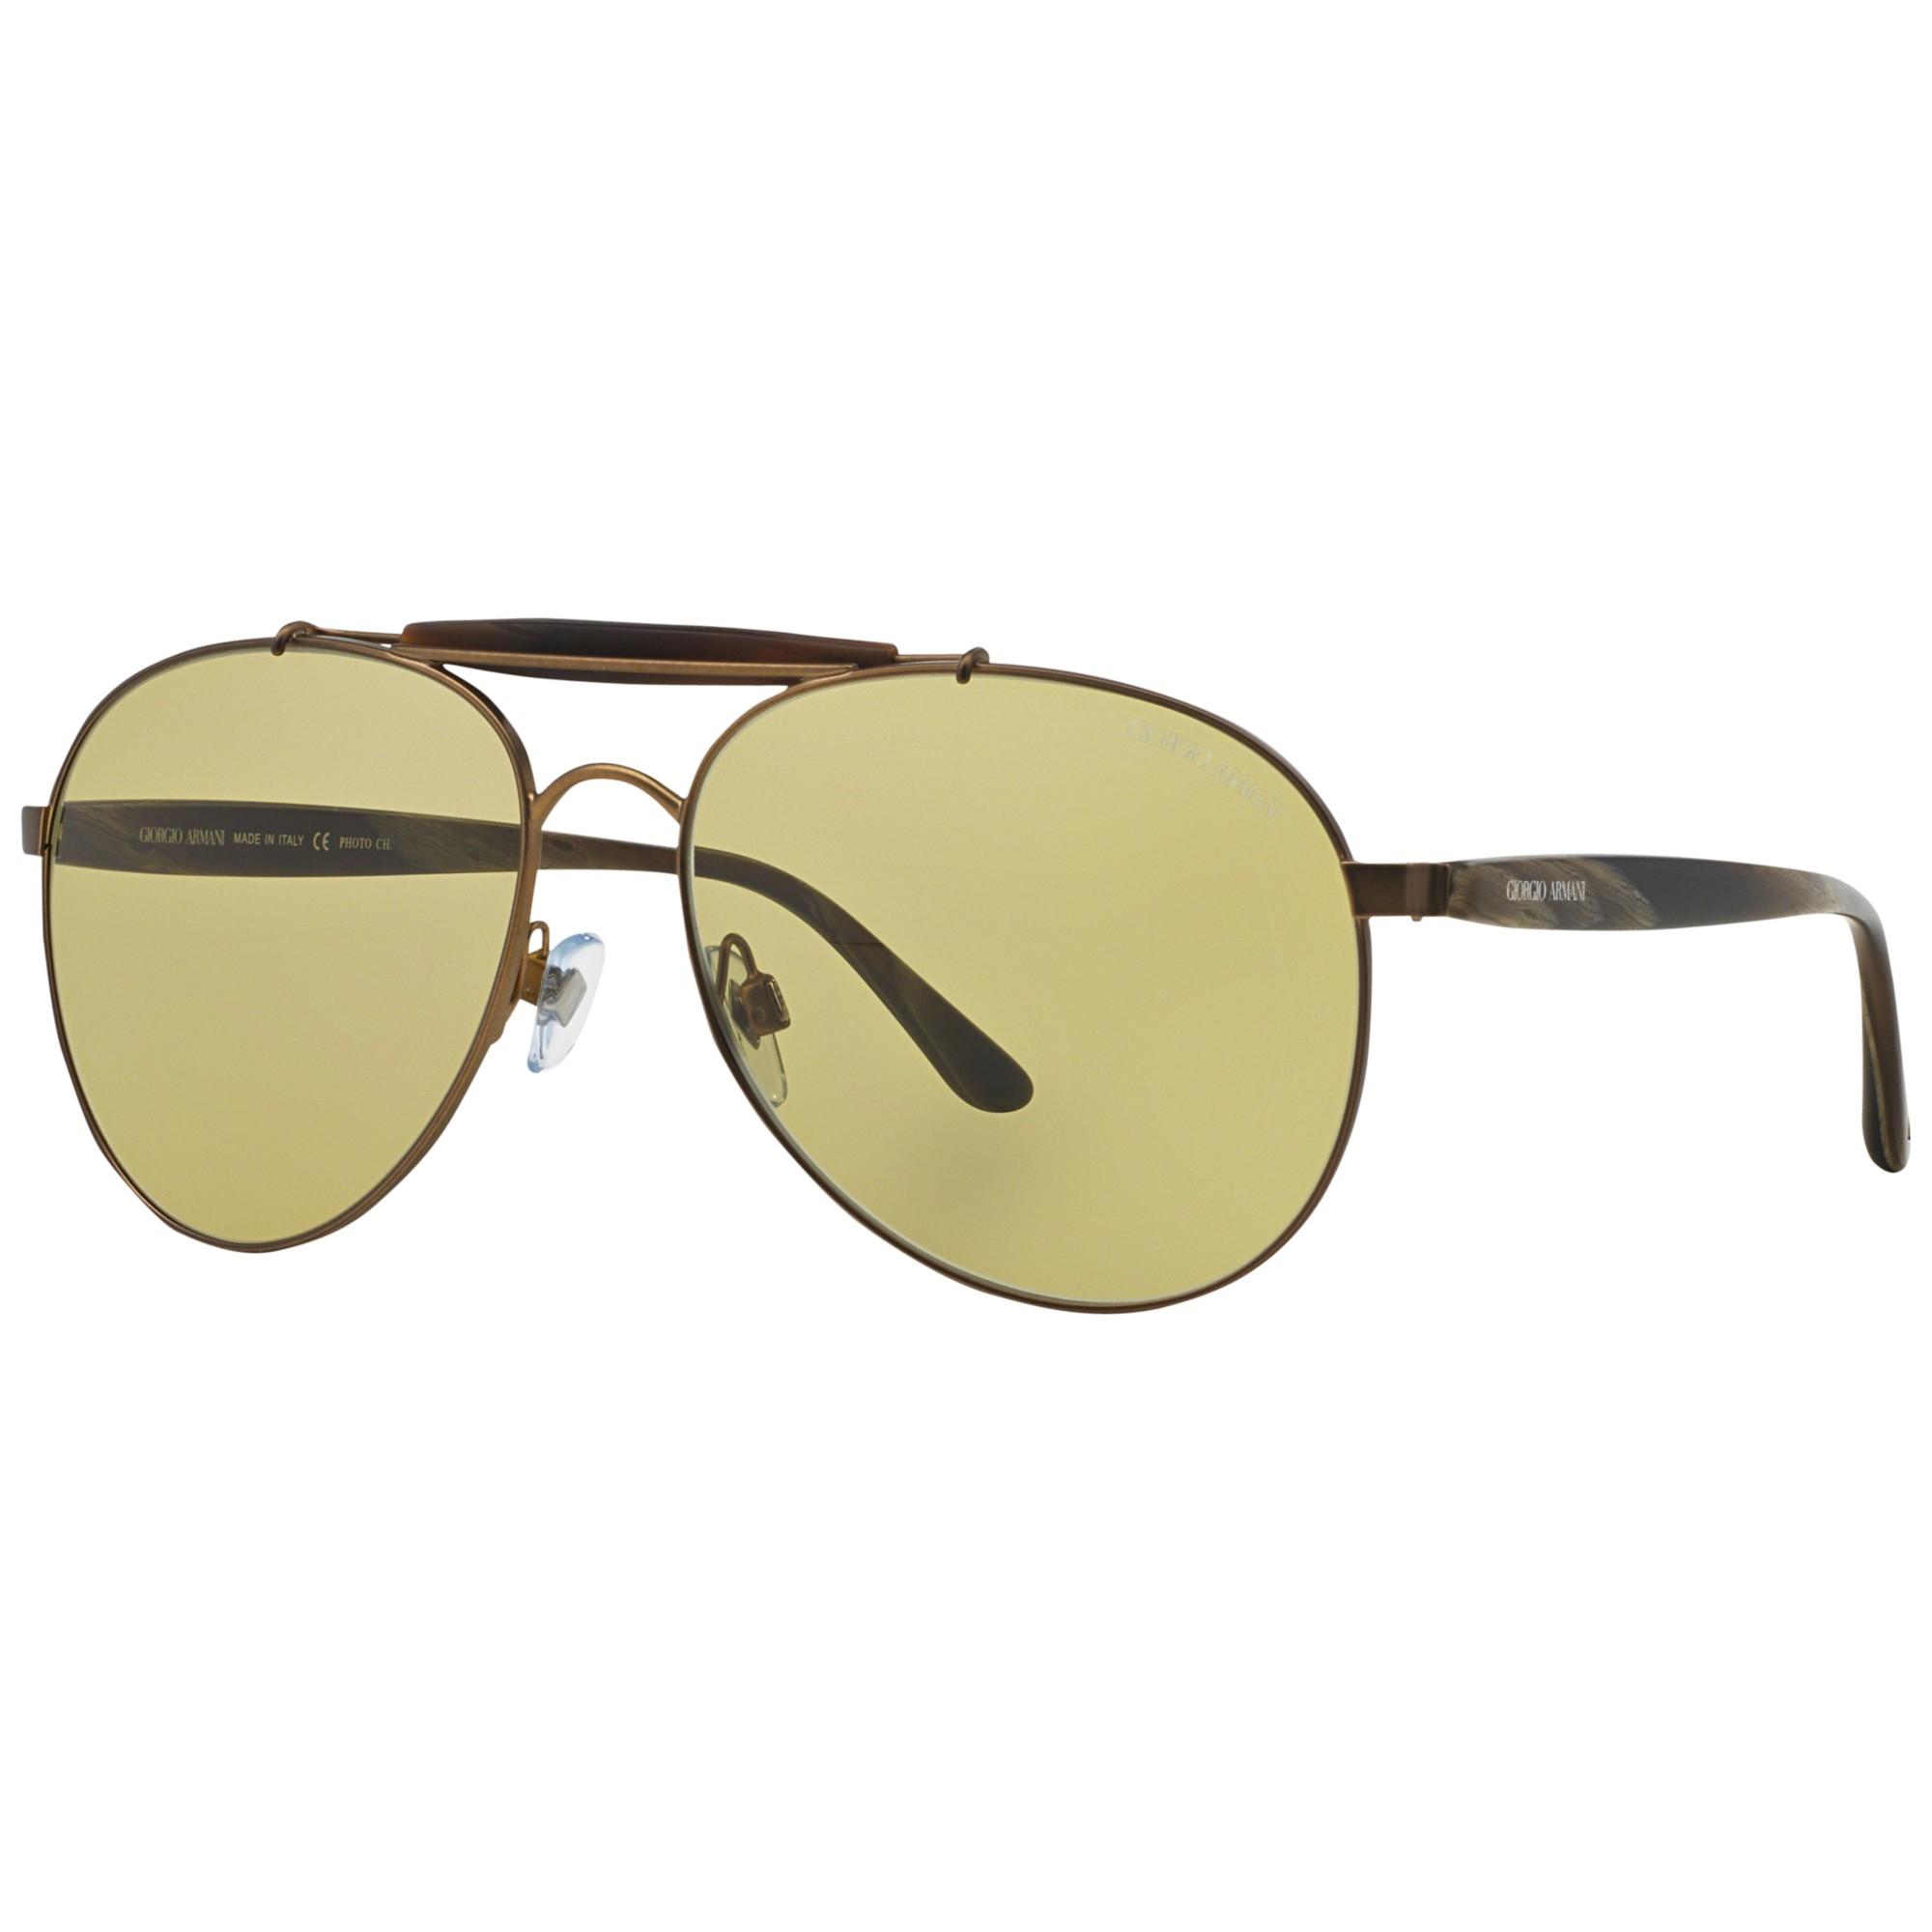 1ea45ccb4f Giorgio Armani Ar6022 Pilot Metal Framed Sunglasses in Gray - Lyst